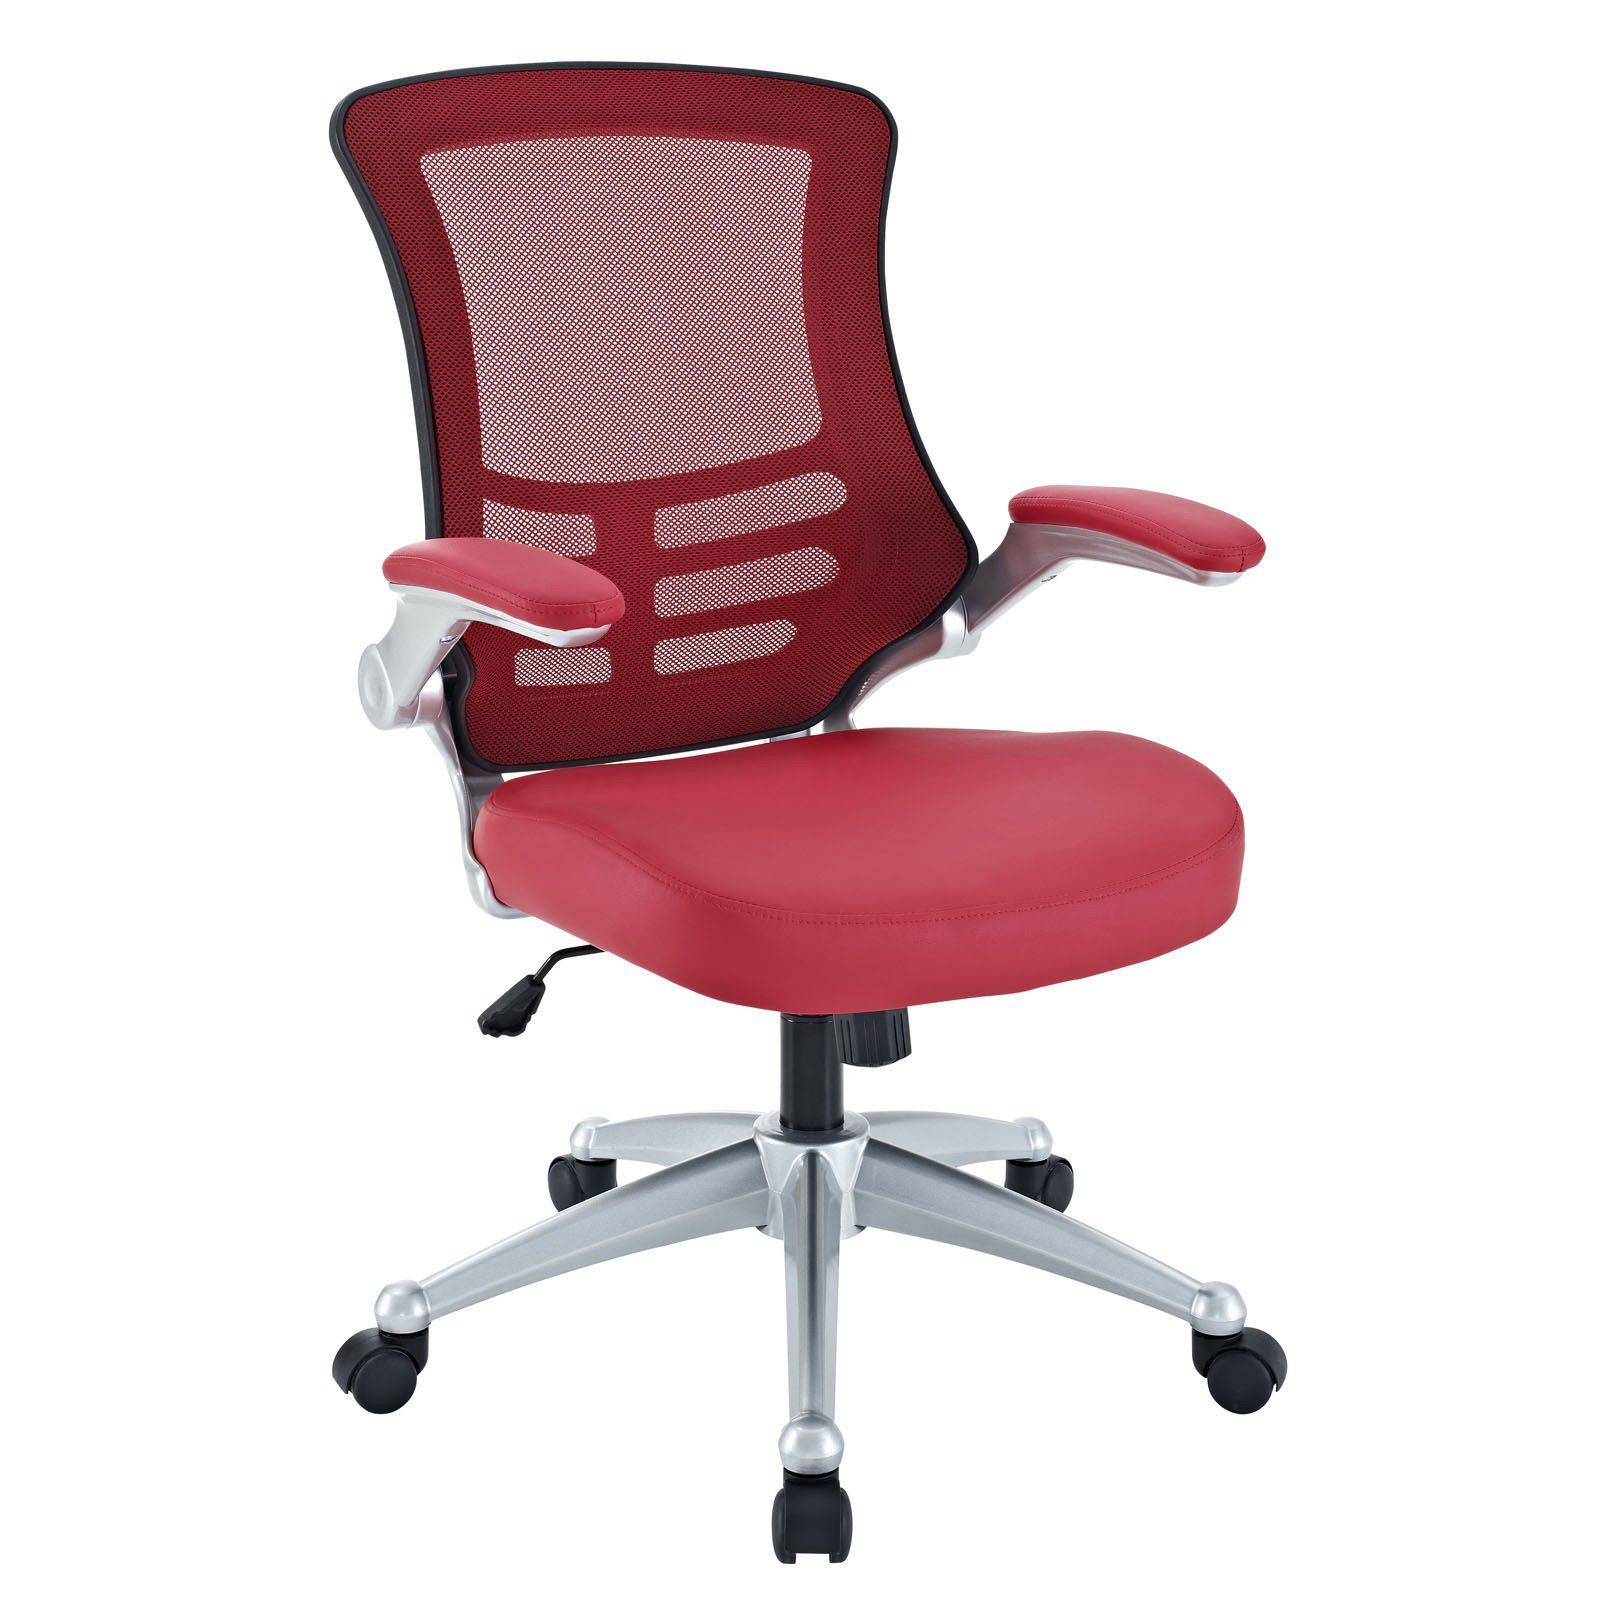 Modway Modern Attainment Adjustable Computer Office Chair Eei 210 Mesh Office Chair Office Chairs Online Ergonomic Chair